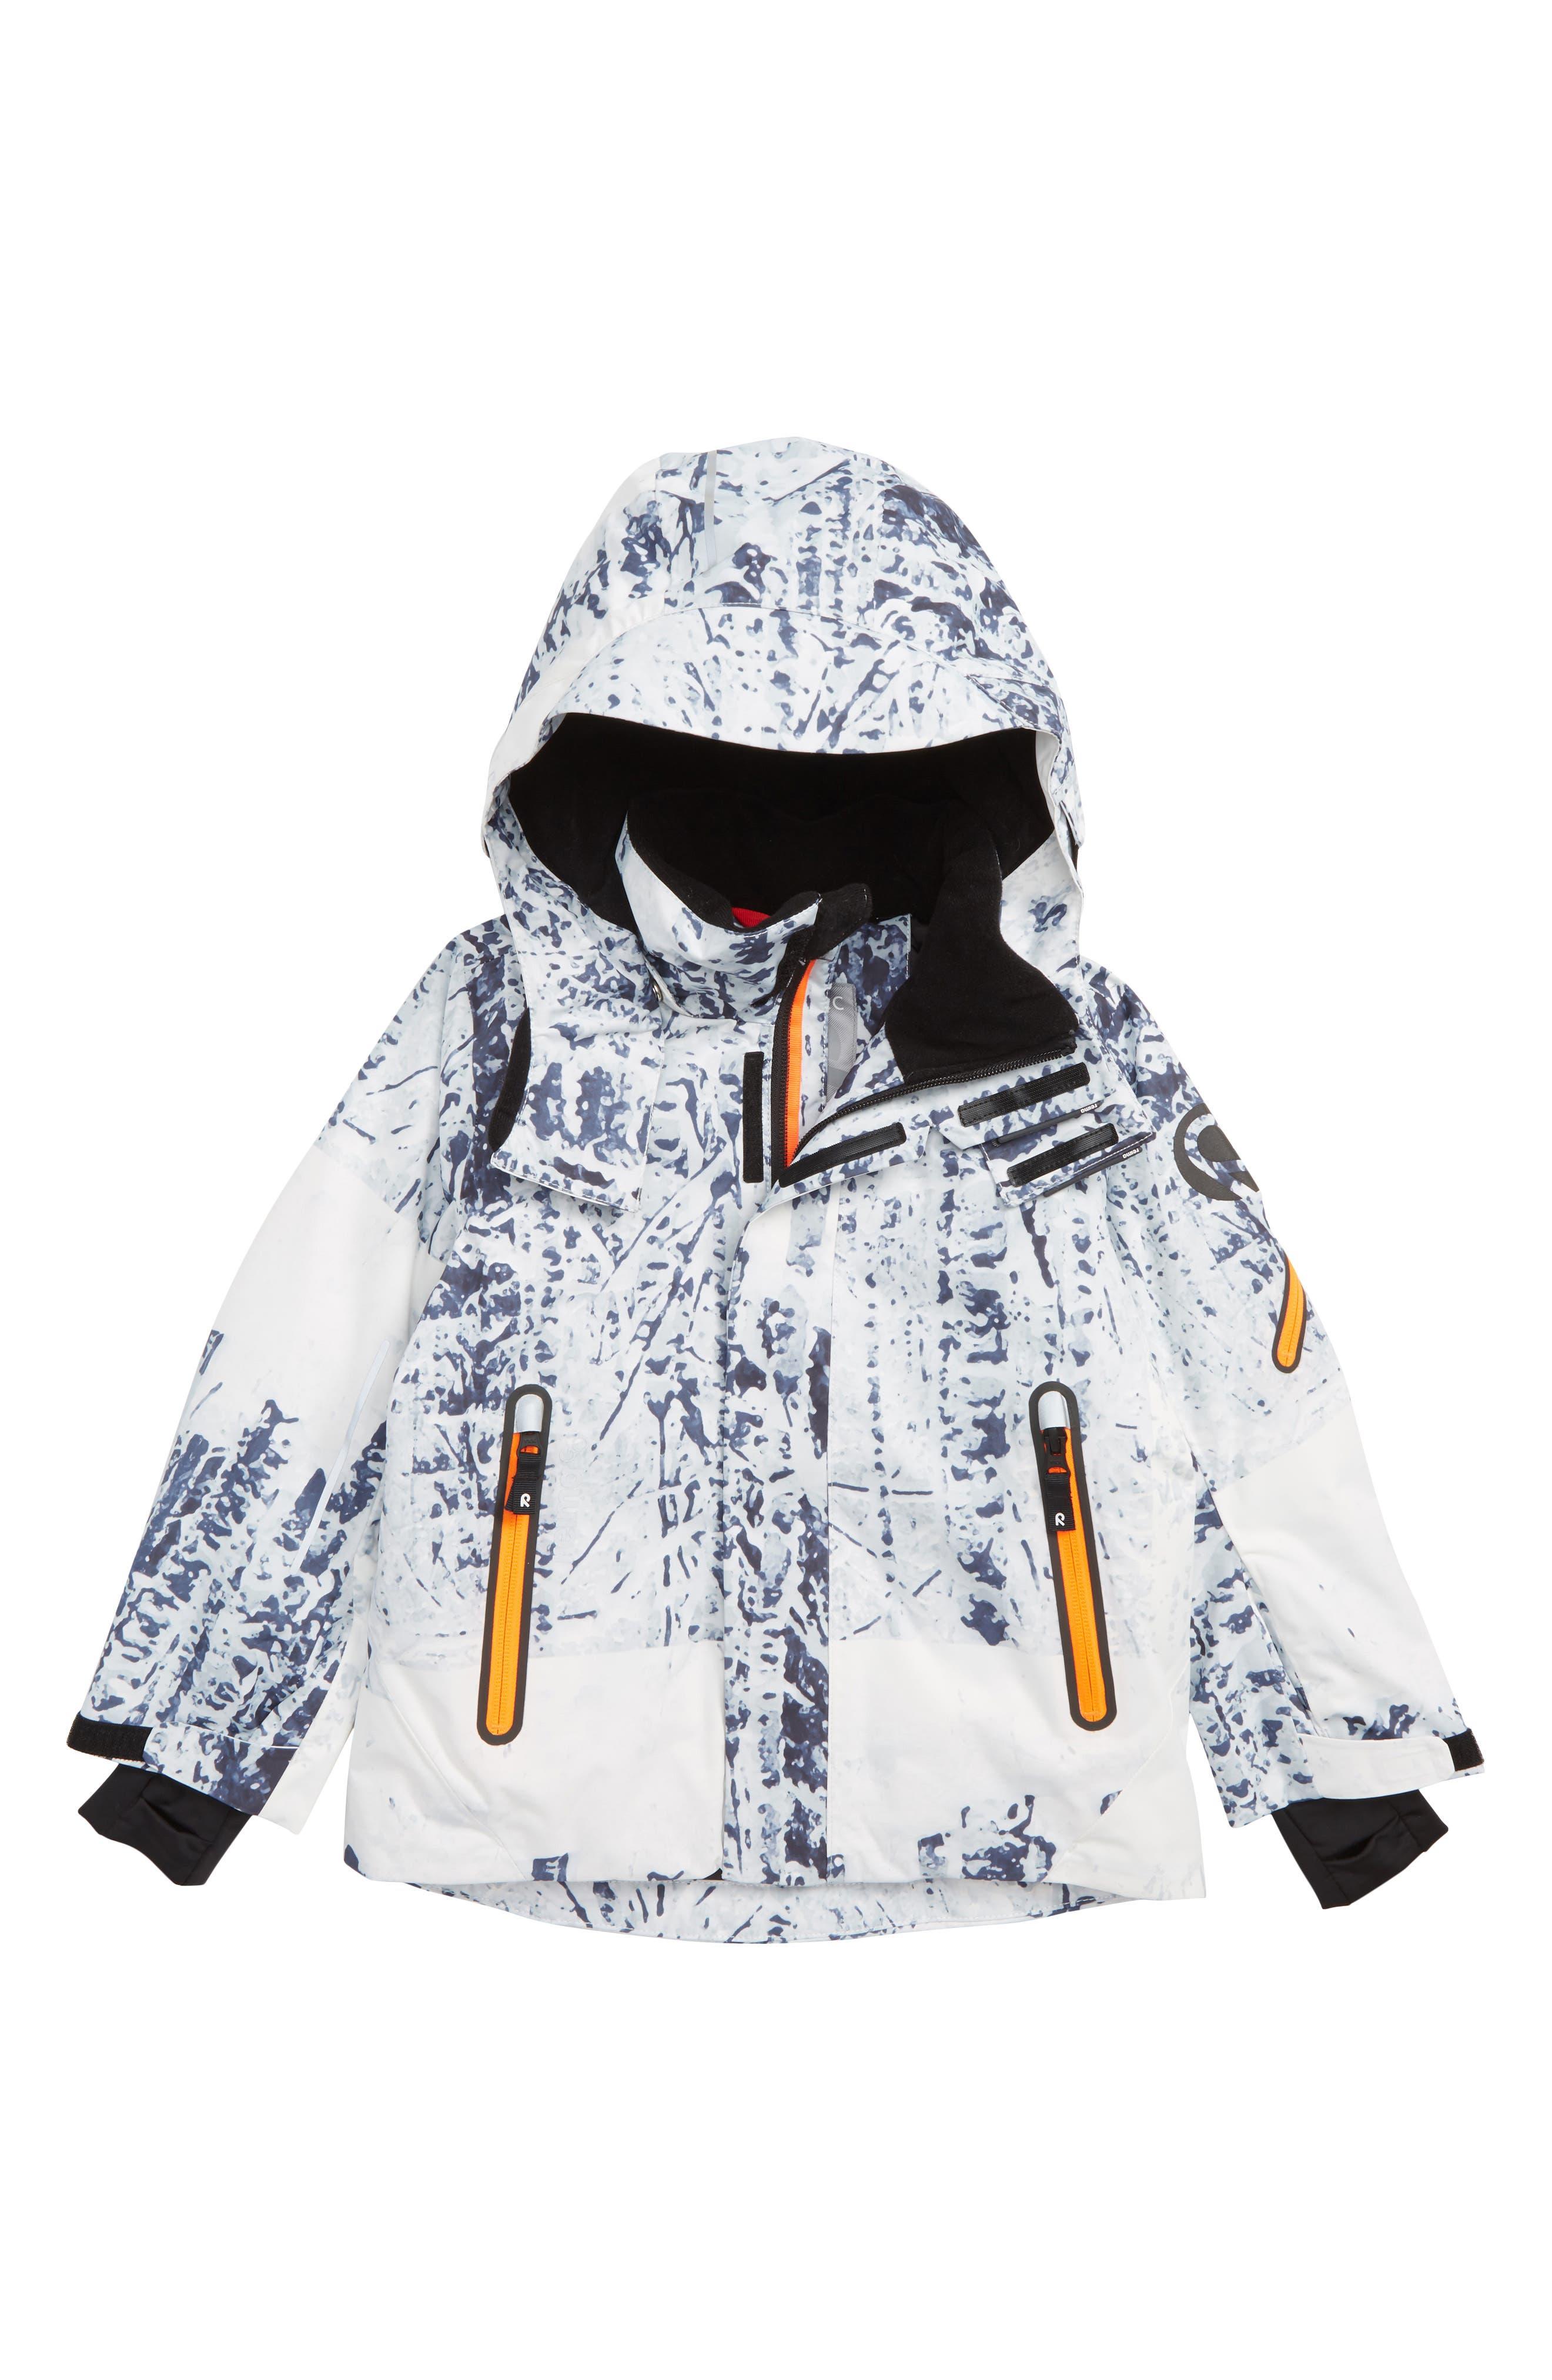 Reimatec<sup>®</sup> Wheeler Waterproof Hooded Jacket,                             Main thumbnail 1, color,                             WHITE PRINT